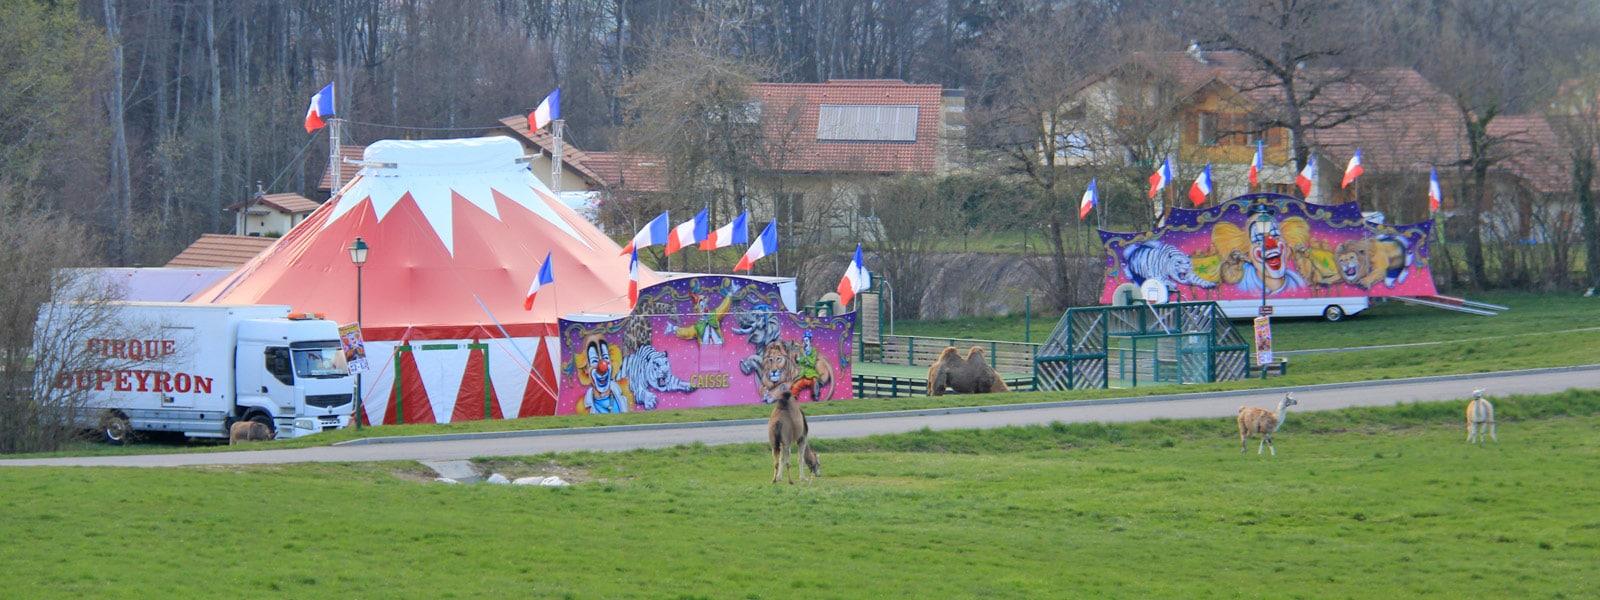 Cirque Dupeyron à l'agorespace mardi 4 avril à 18h et mercredi 5 avril à 16h.